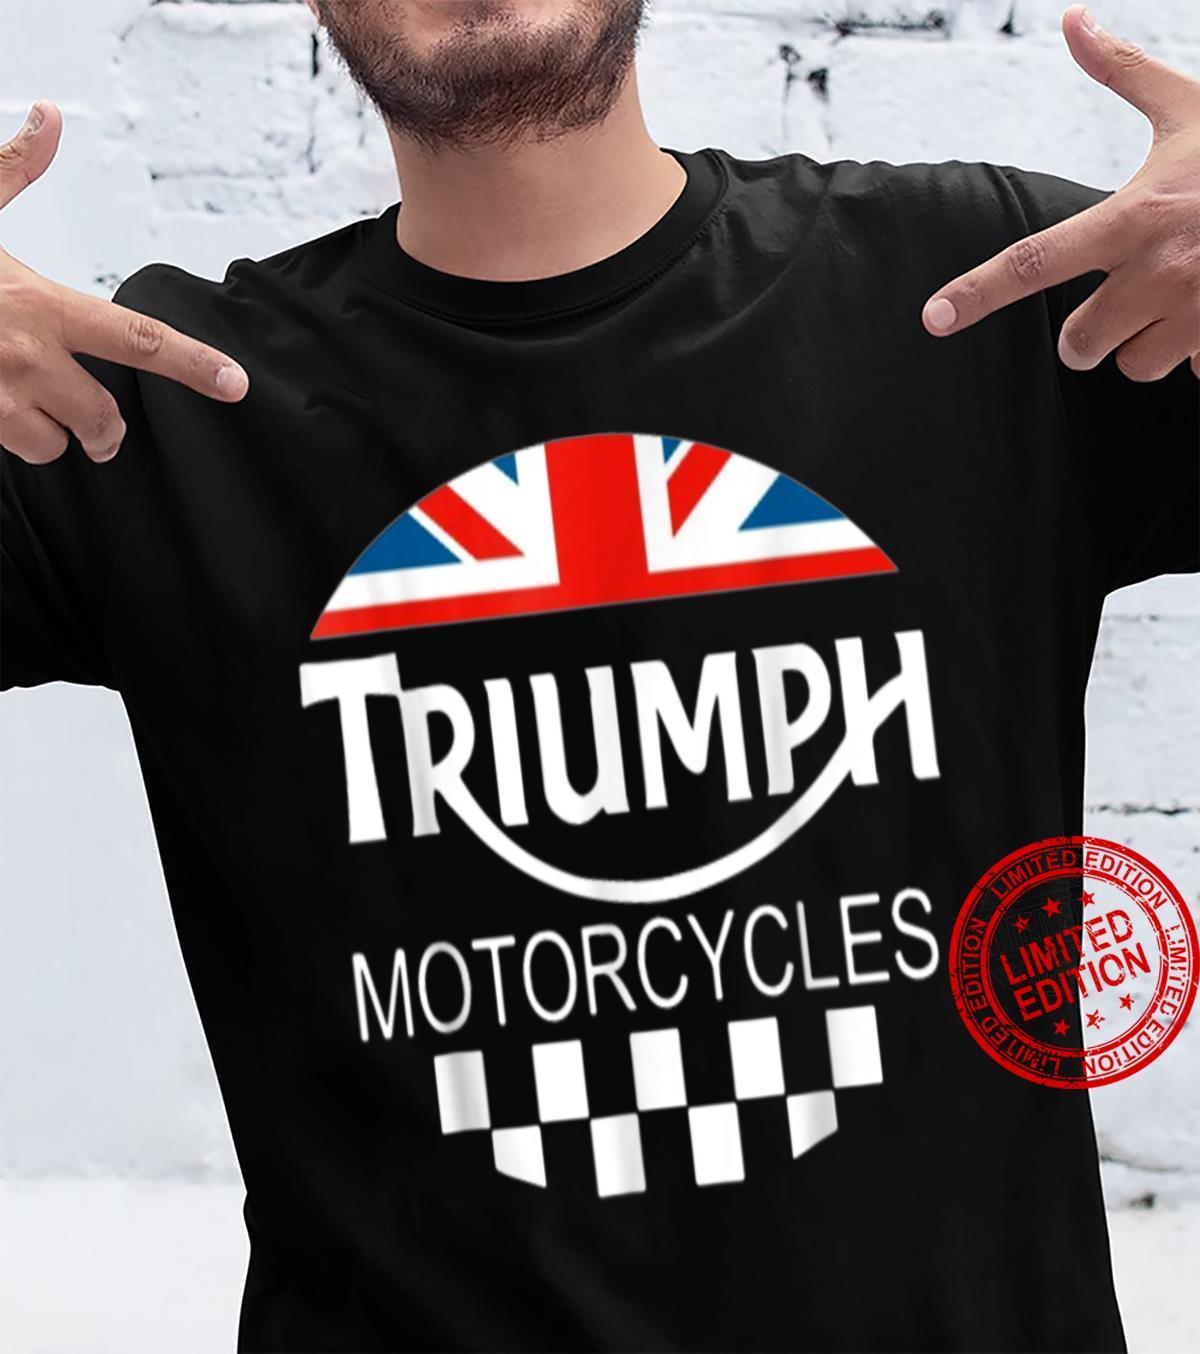 Motorcycle Triumph Biker U.k United Kingdom Shirt